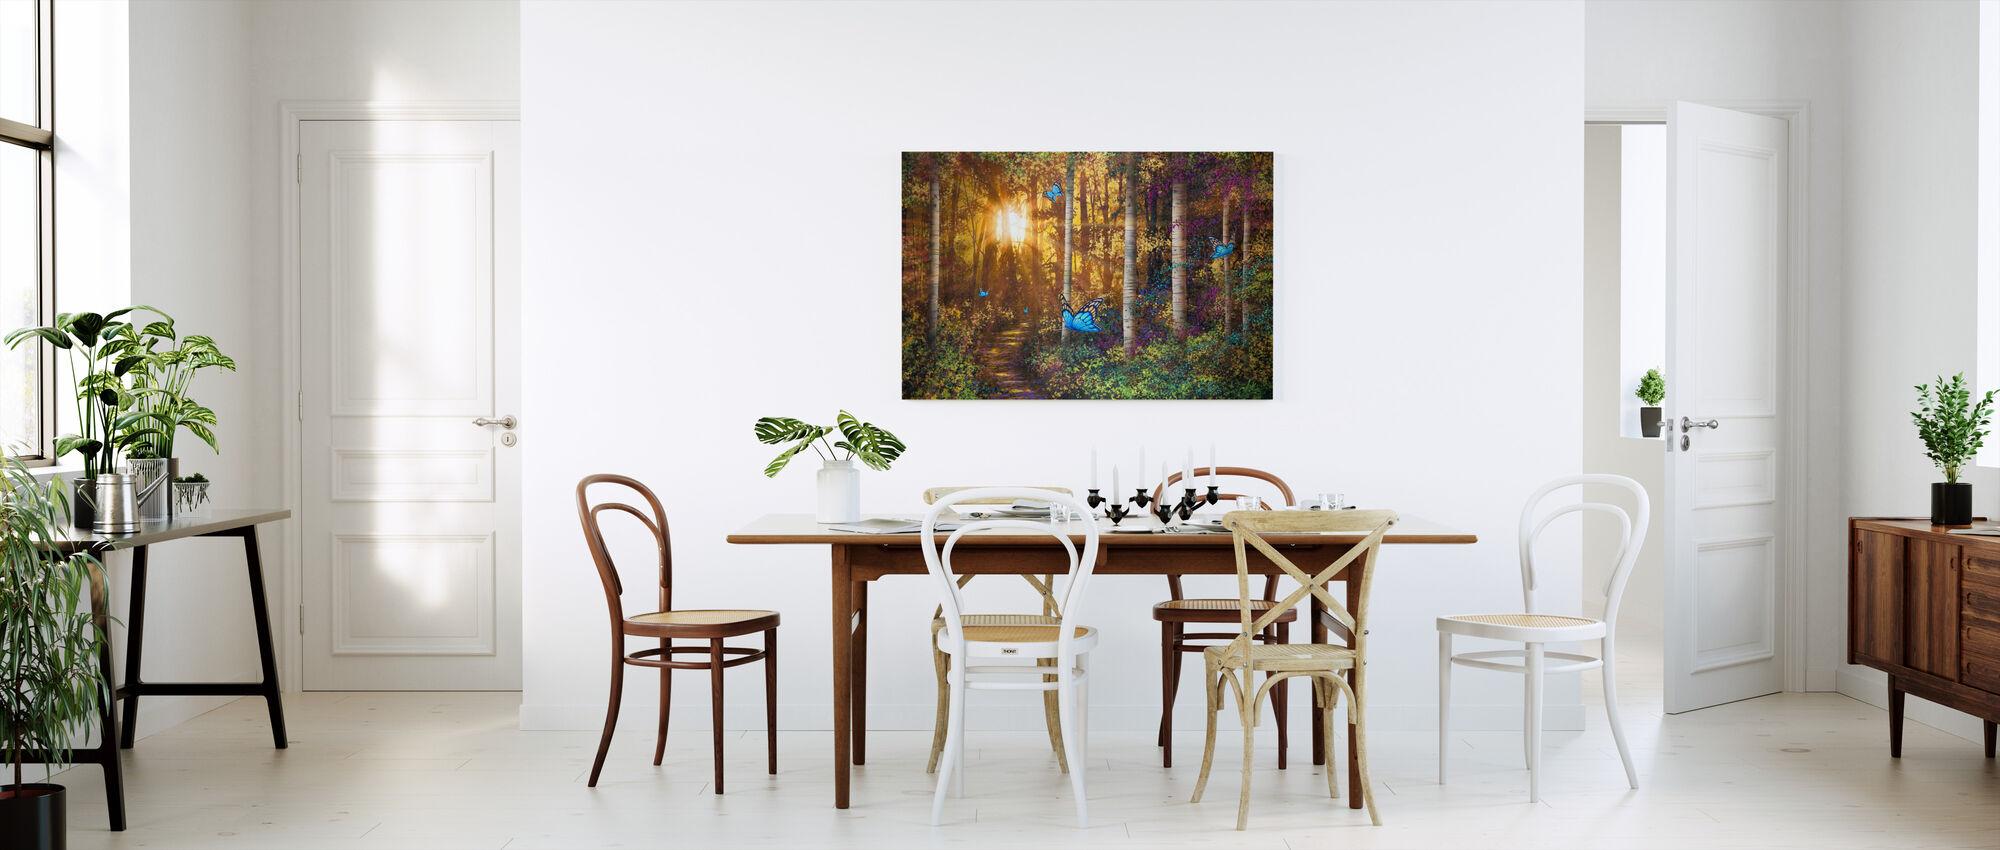 Skovspor med sommerfugle - Billede på lærred - Køkken